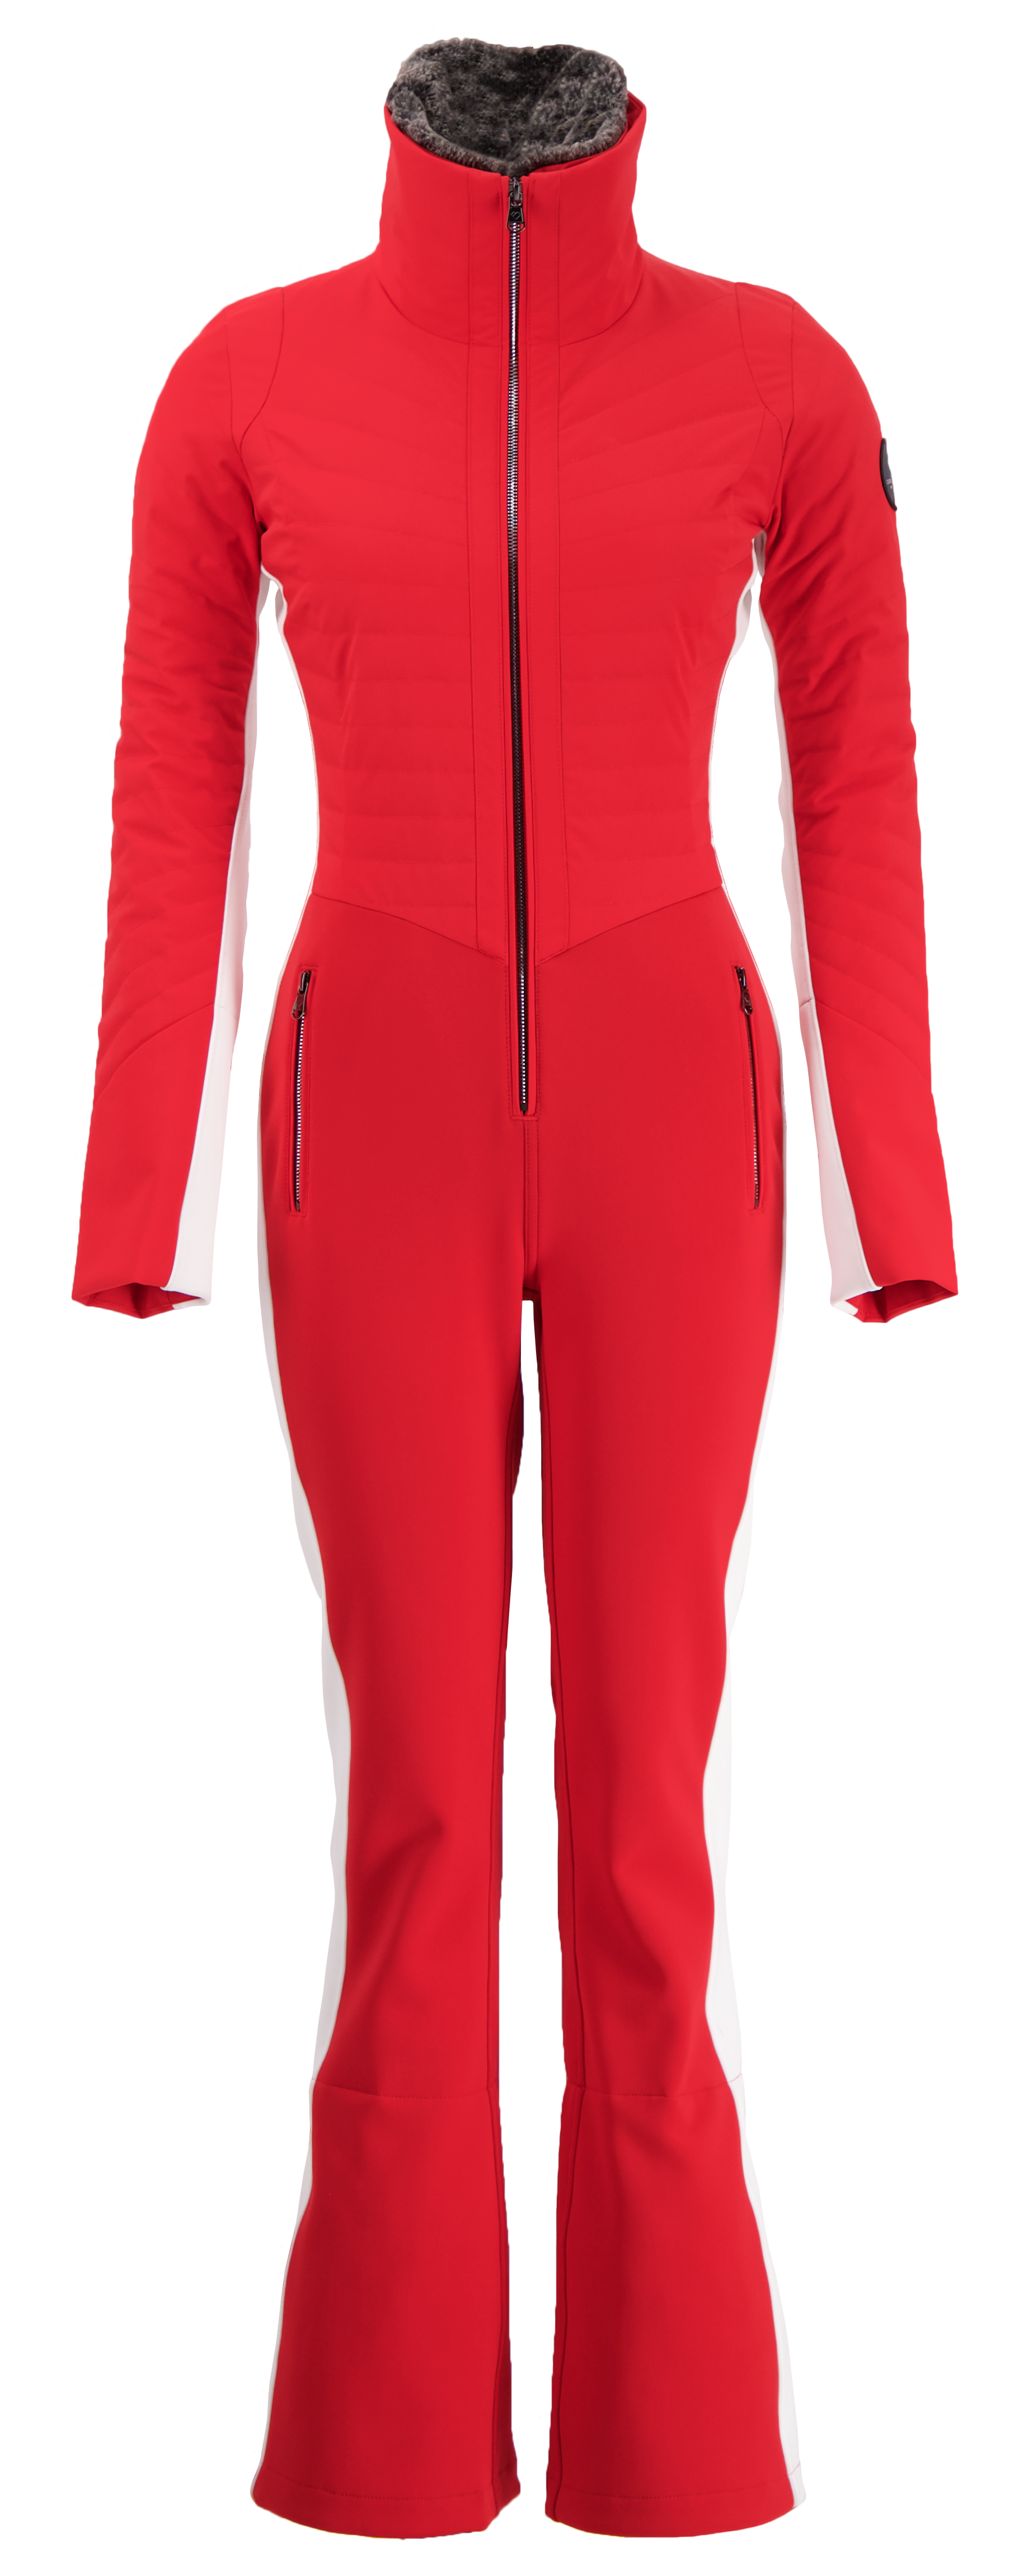 Dakine Outerwear